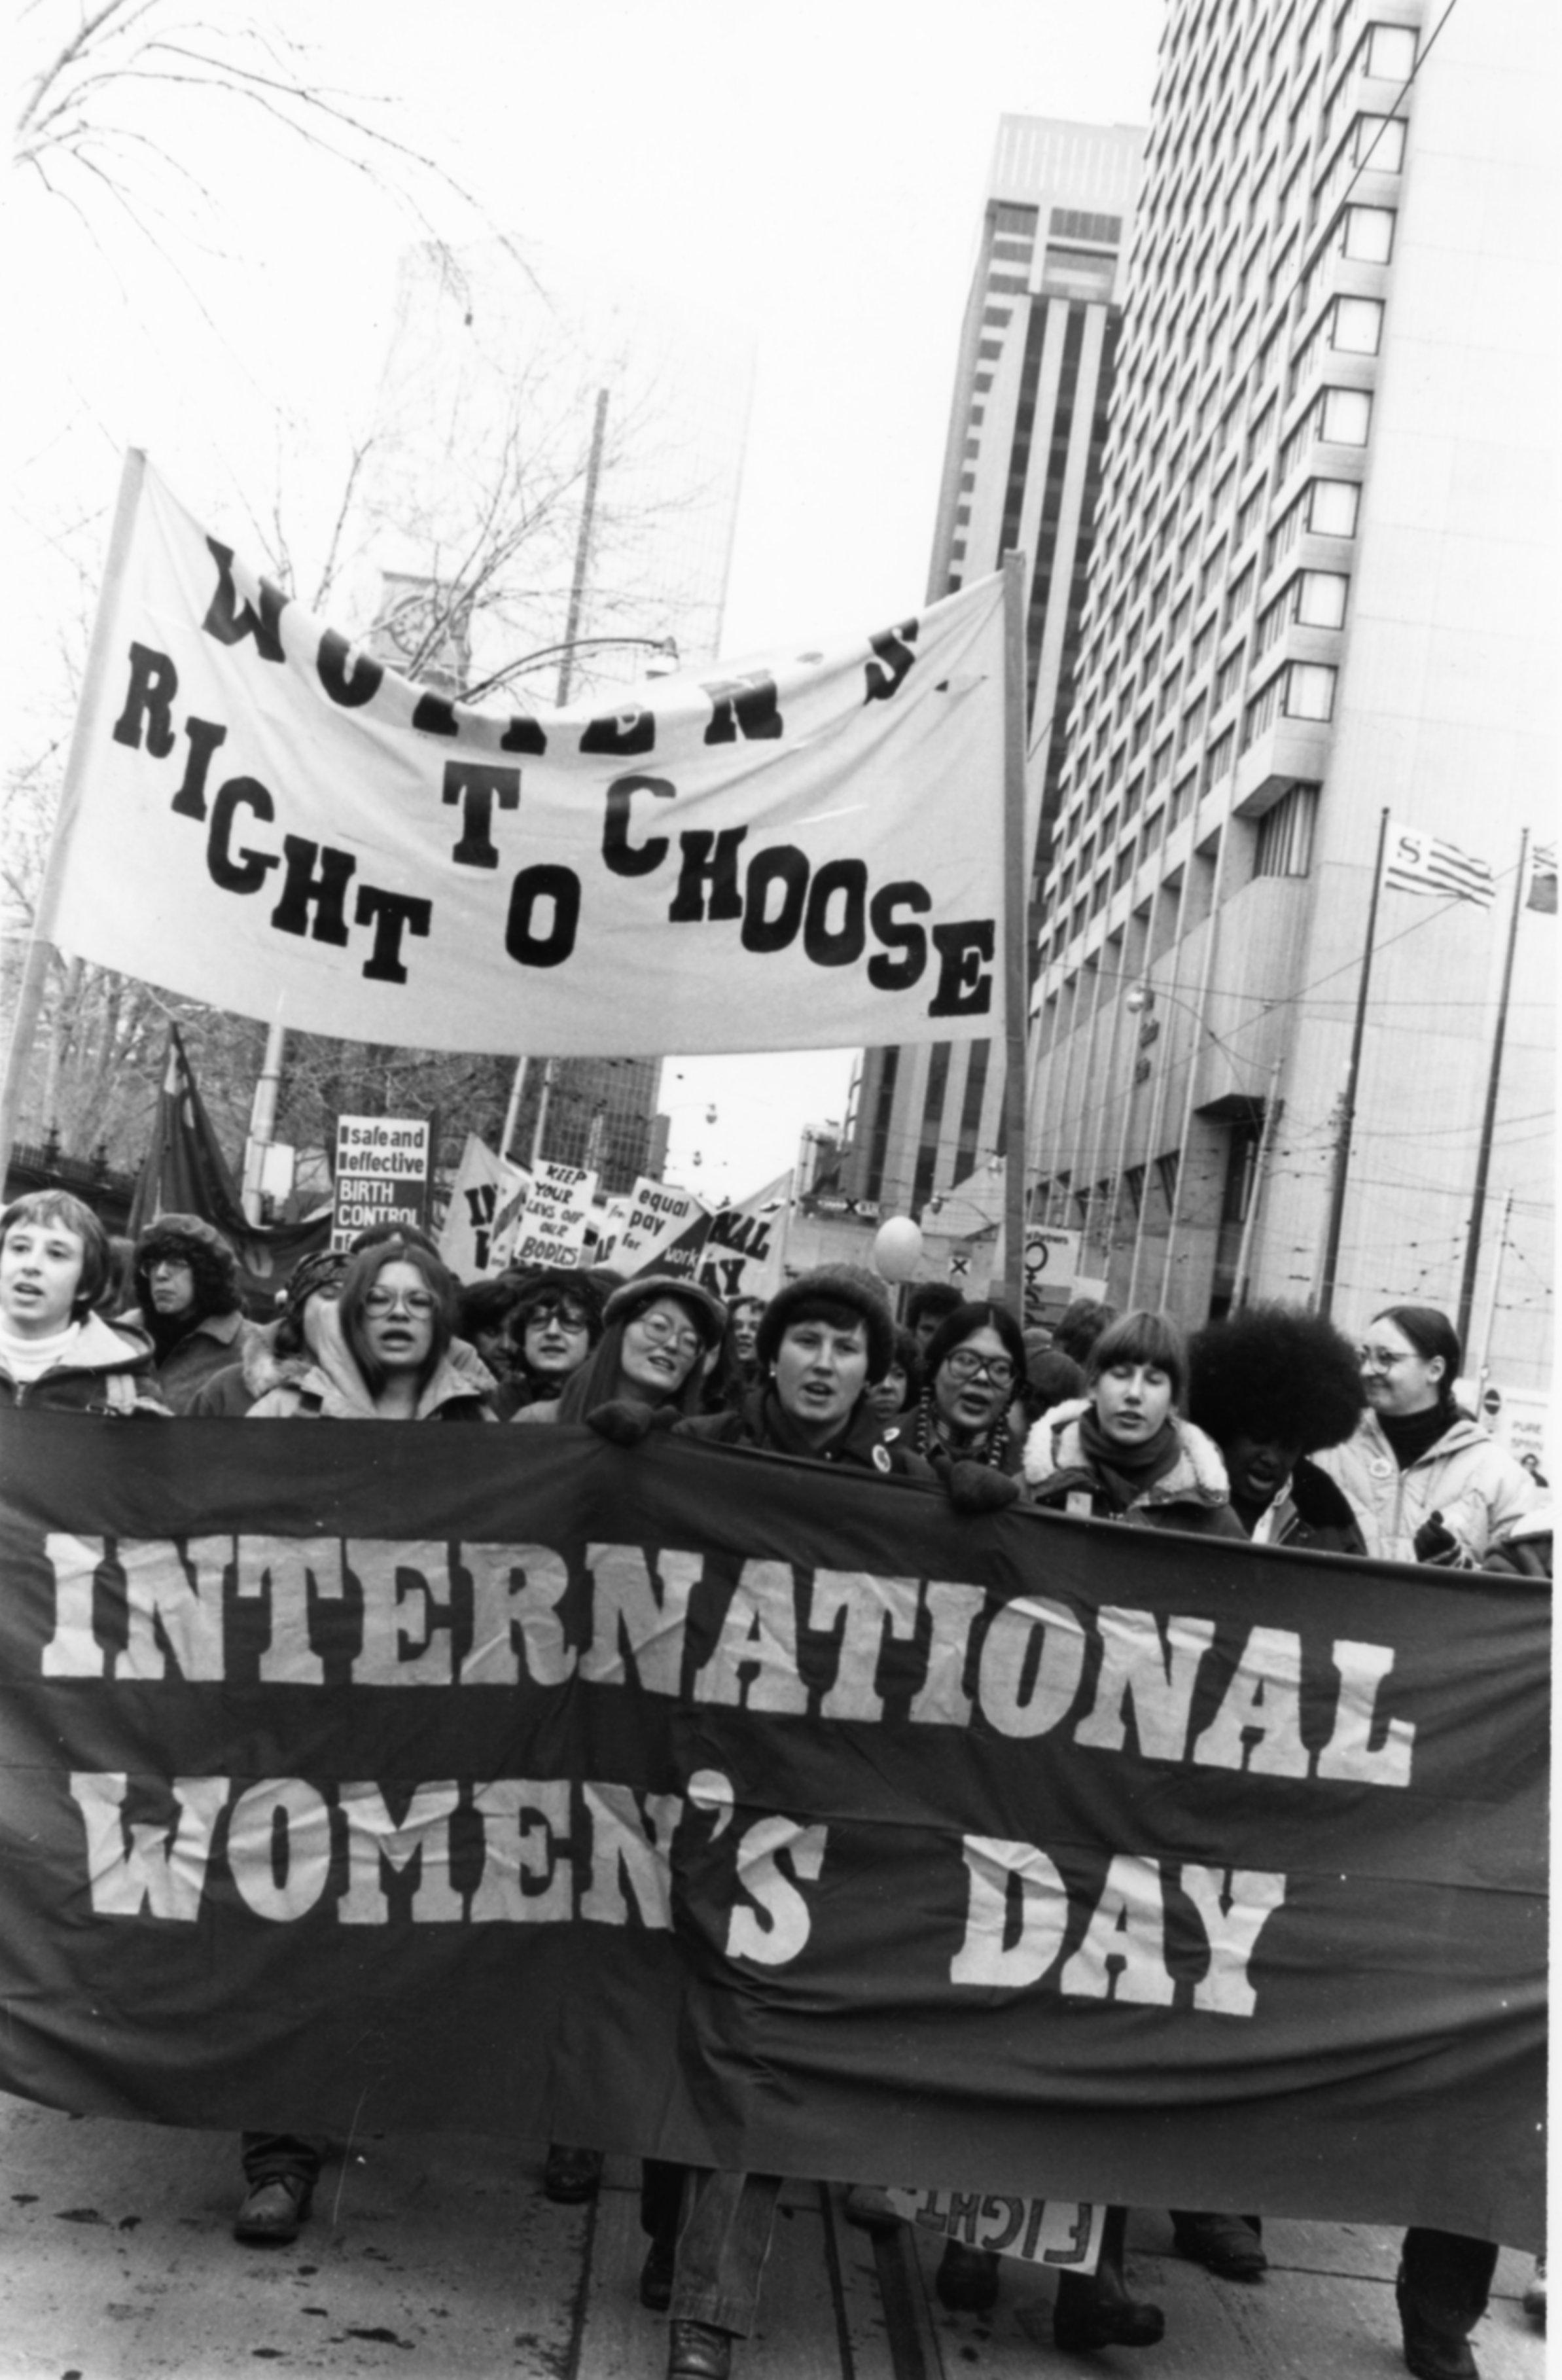 International Women's Day Demonsration